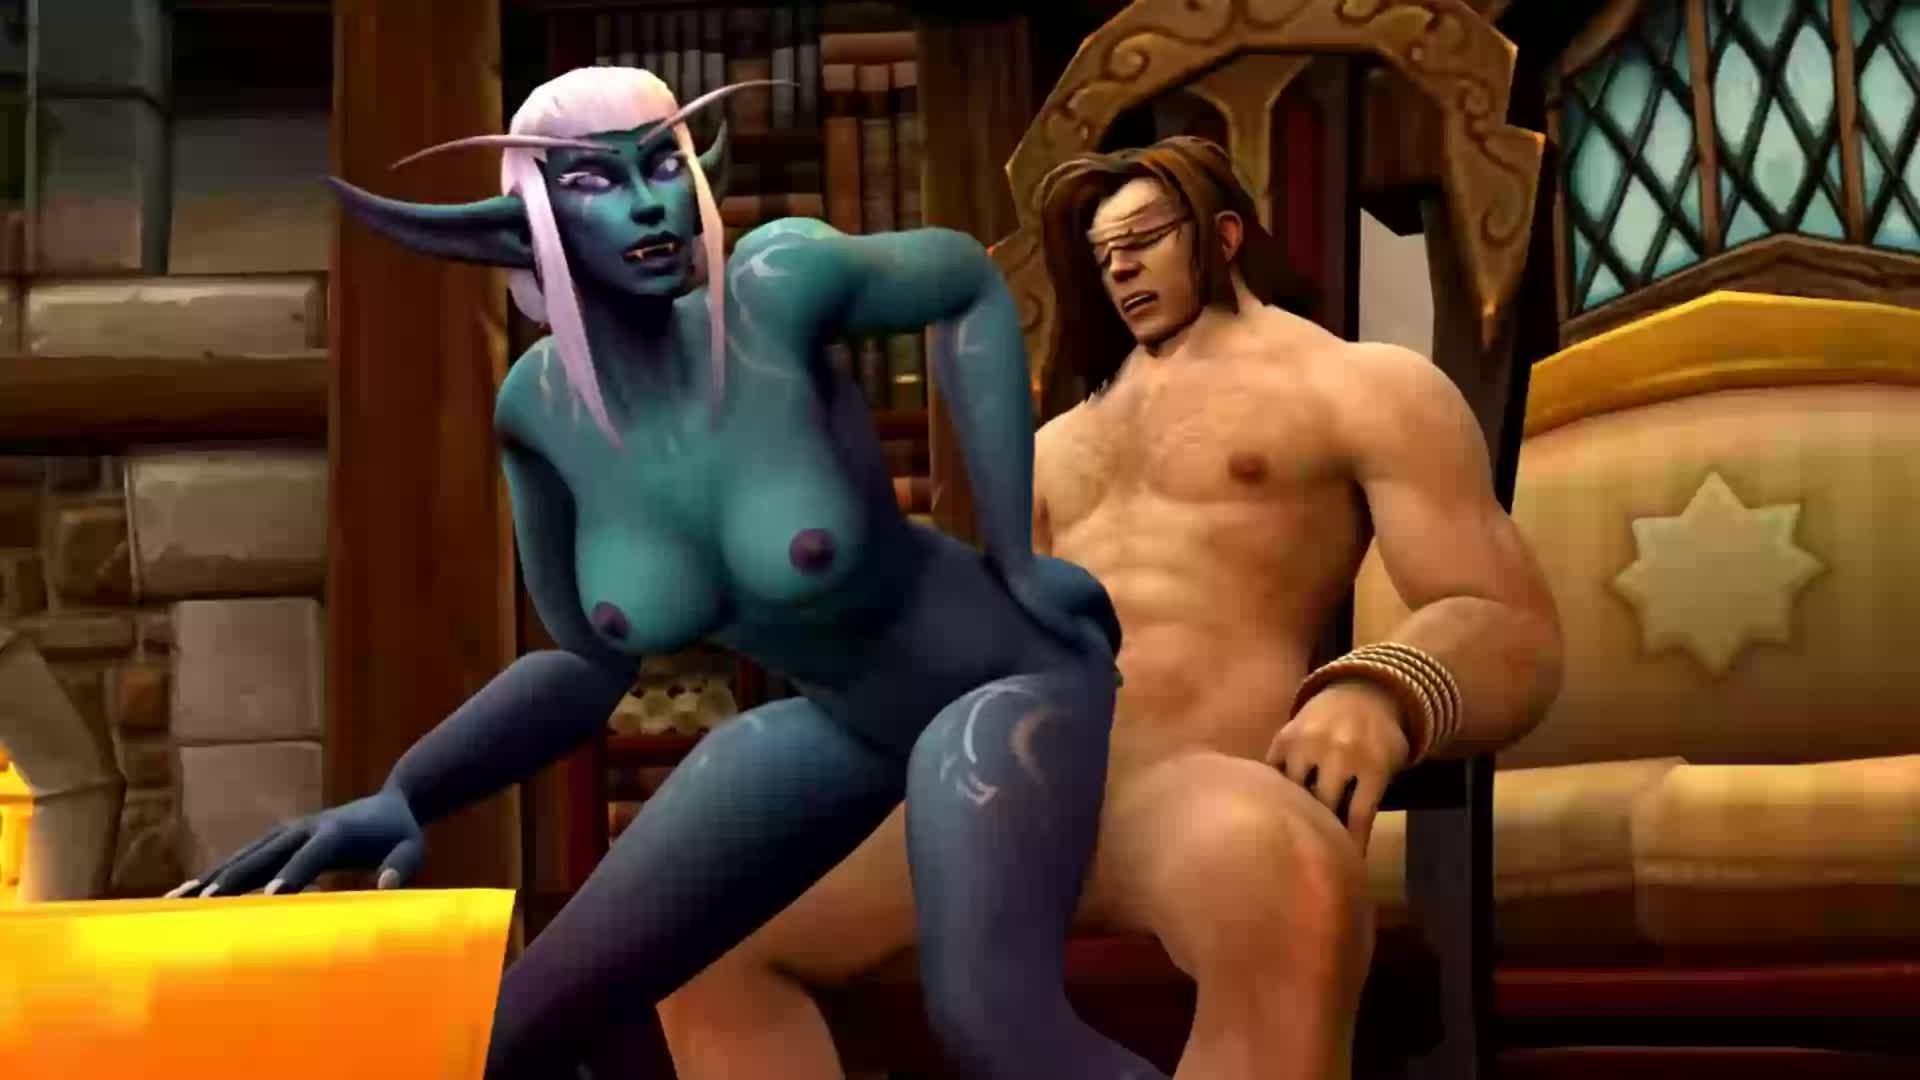 World Of Warcraft Nelf X Orc Hard Fuck Anal Animated Sfm